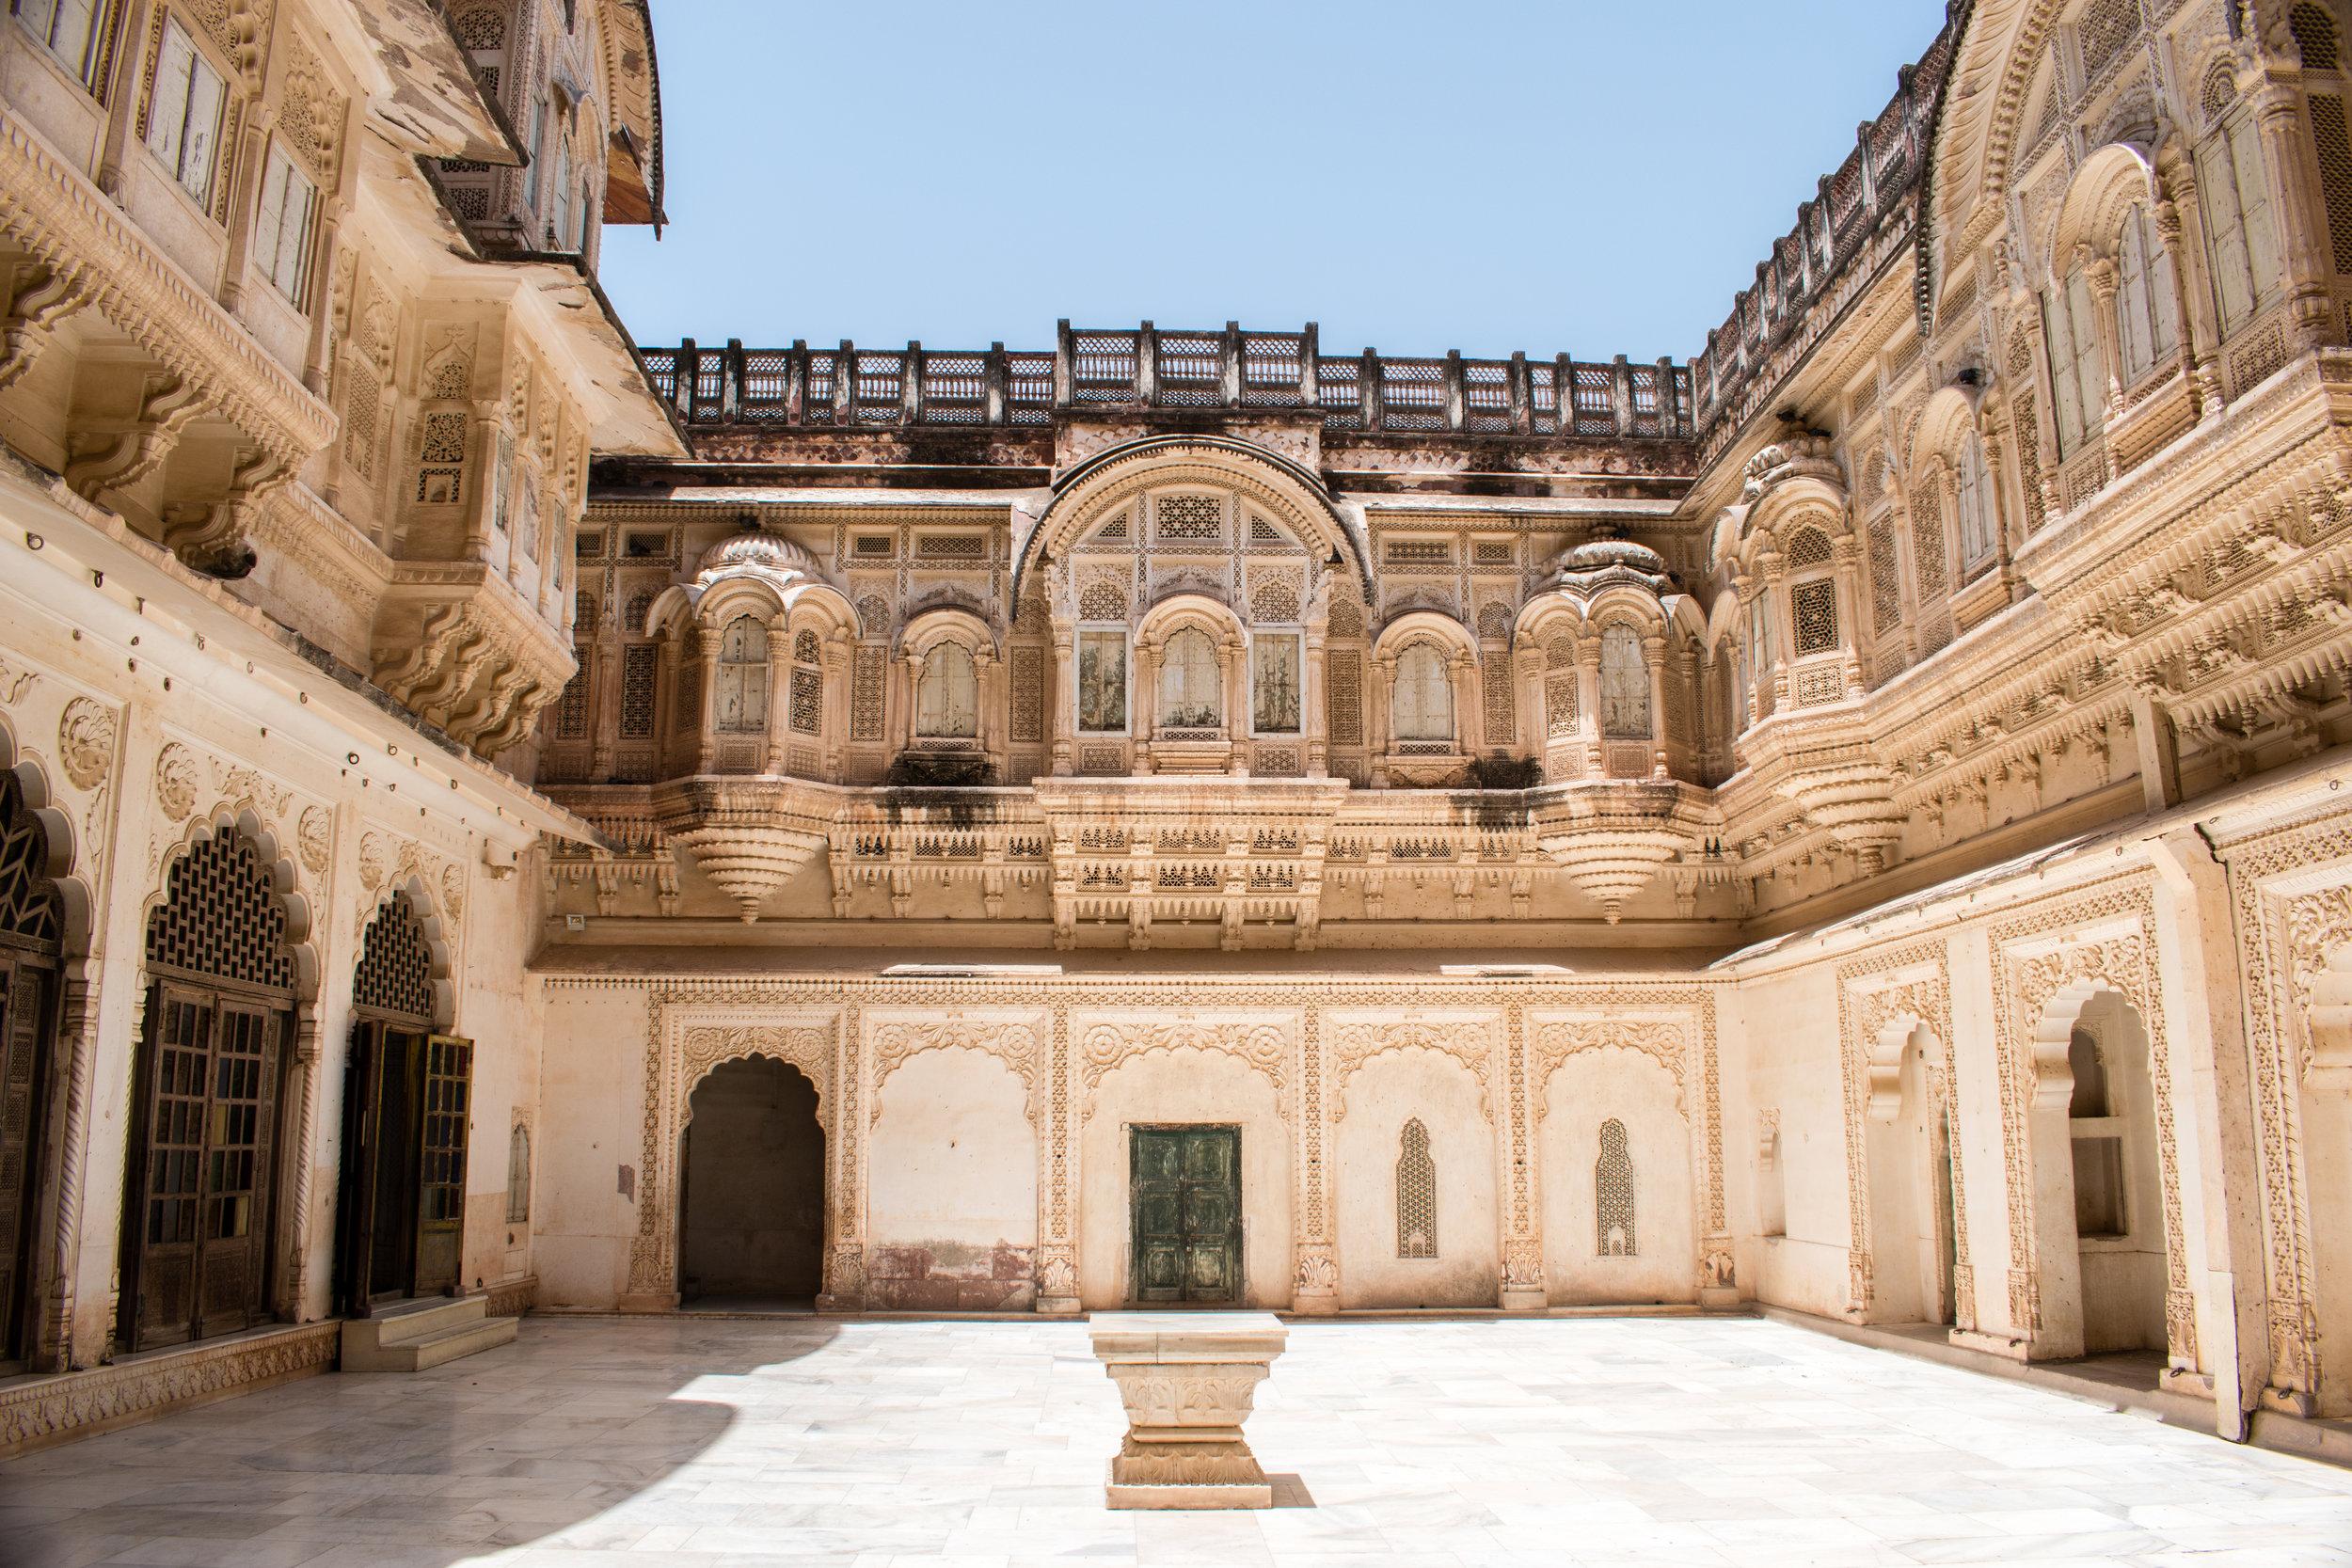 An Interior Courtyard At Mehrangarh Fort in Jodhpur, India